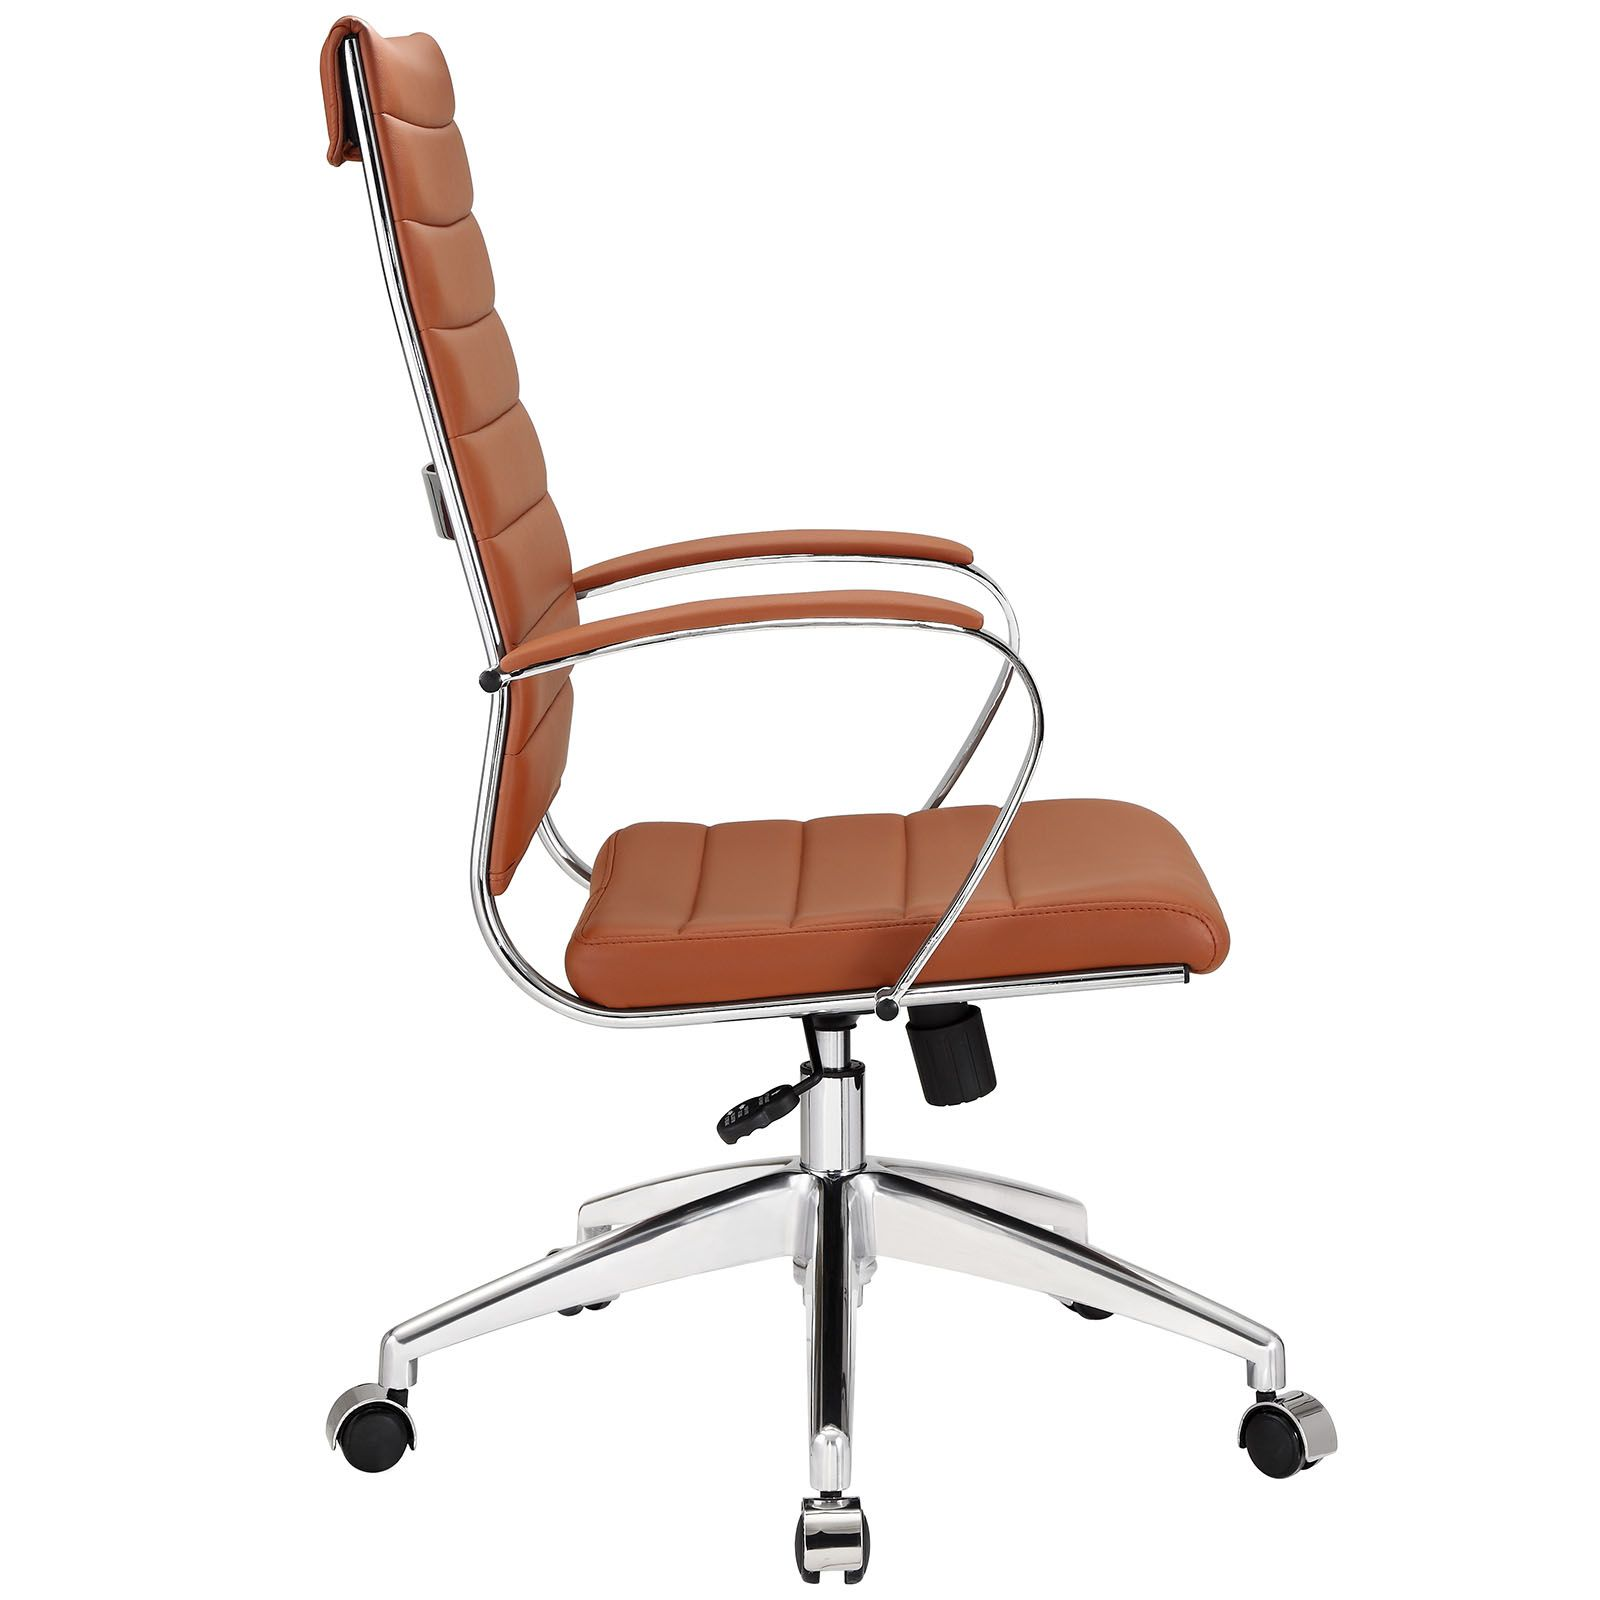 Leather Office Chairs Catania Brown With Glider Moderne Burostuhle Burostuhl Stuhl Leder